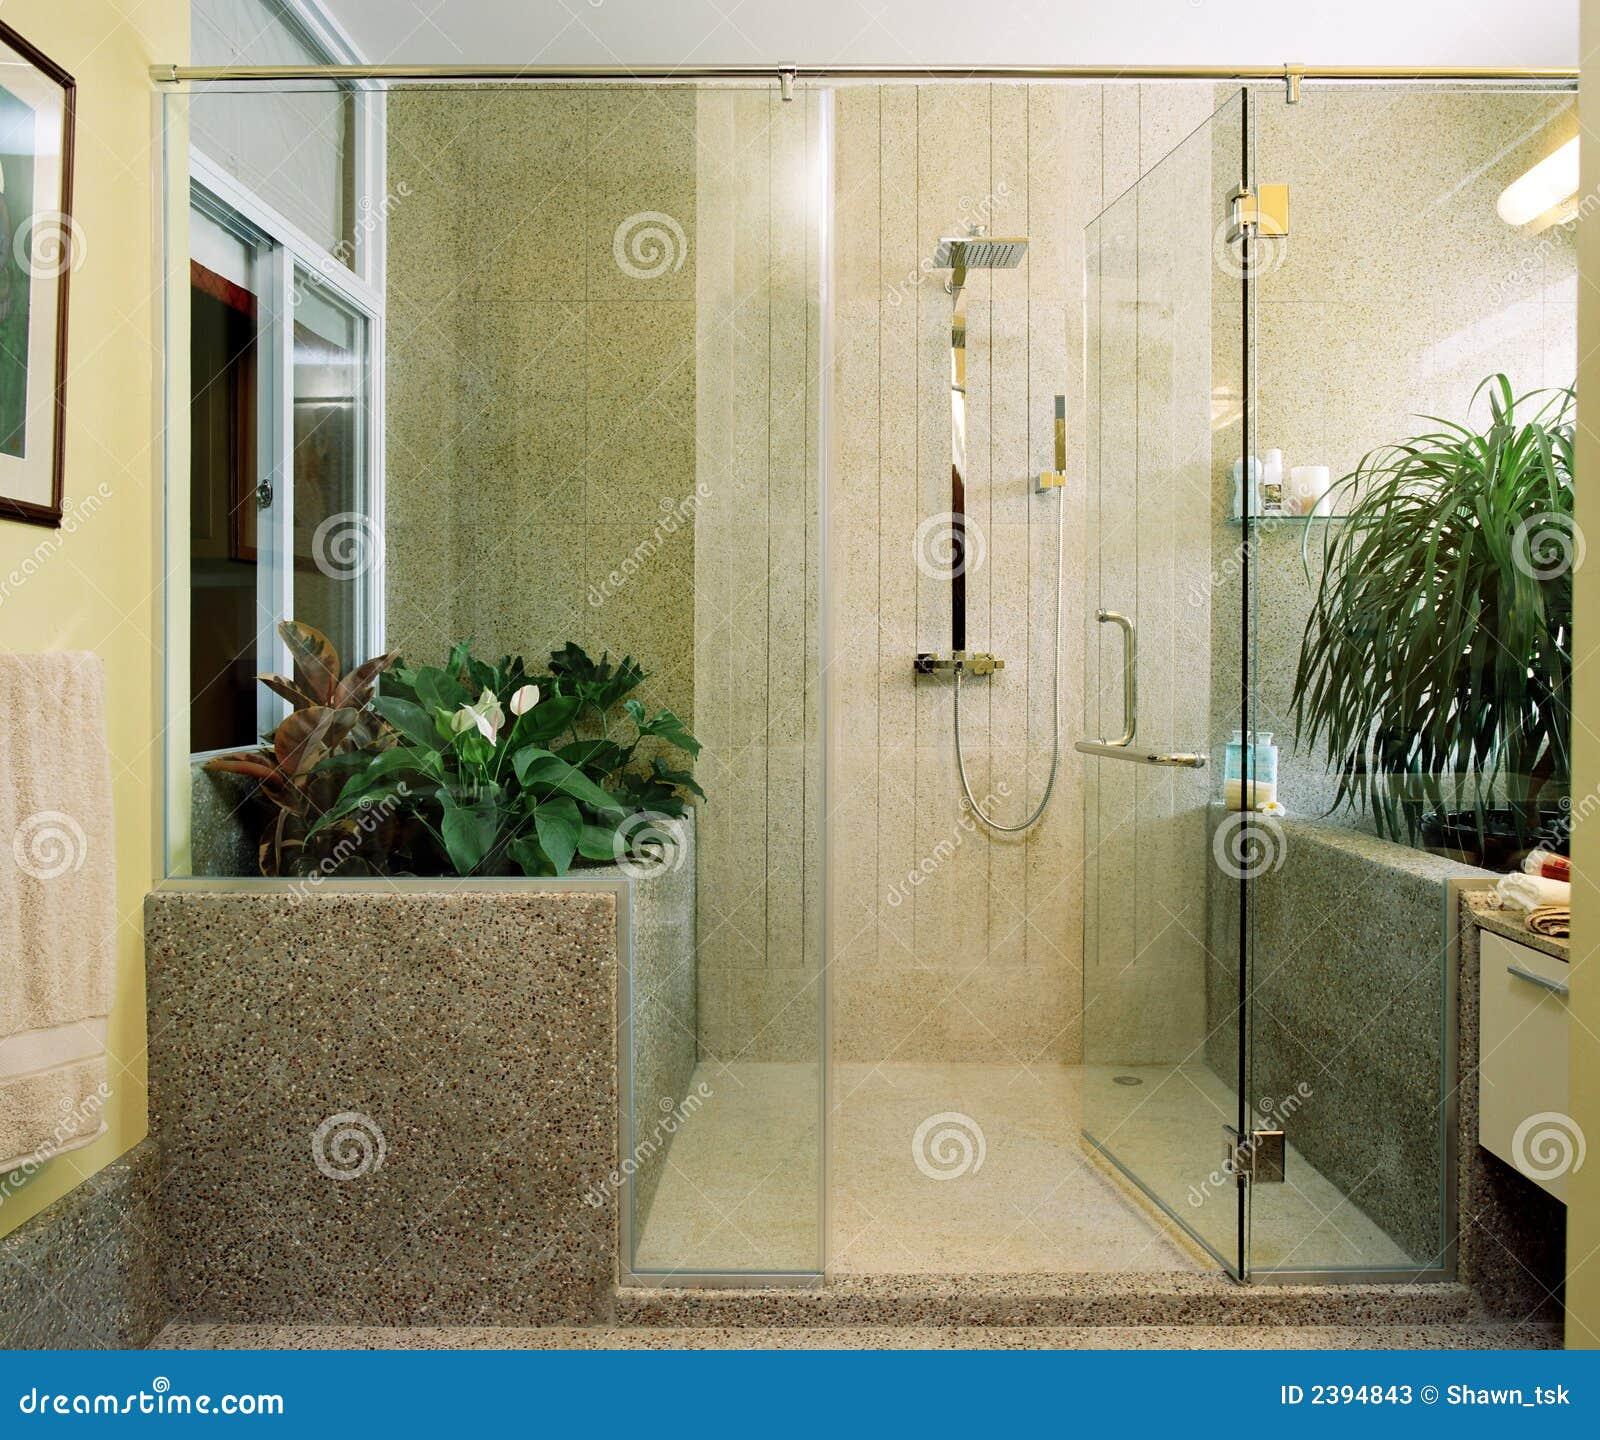 Innenarchitektur badezimmer stockfotos bild 2394843 for Innenarchitektur badezimmer